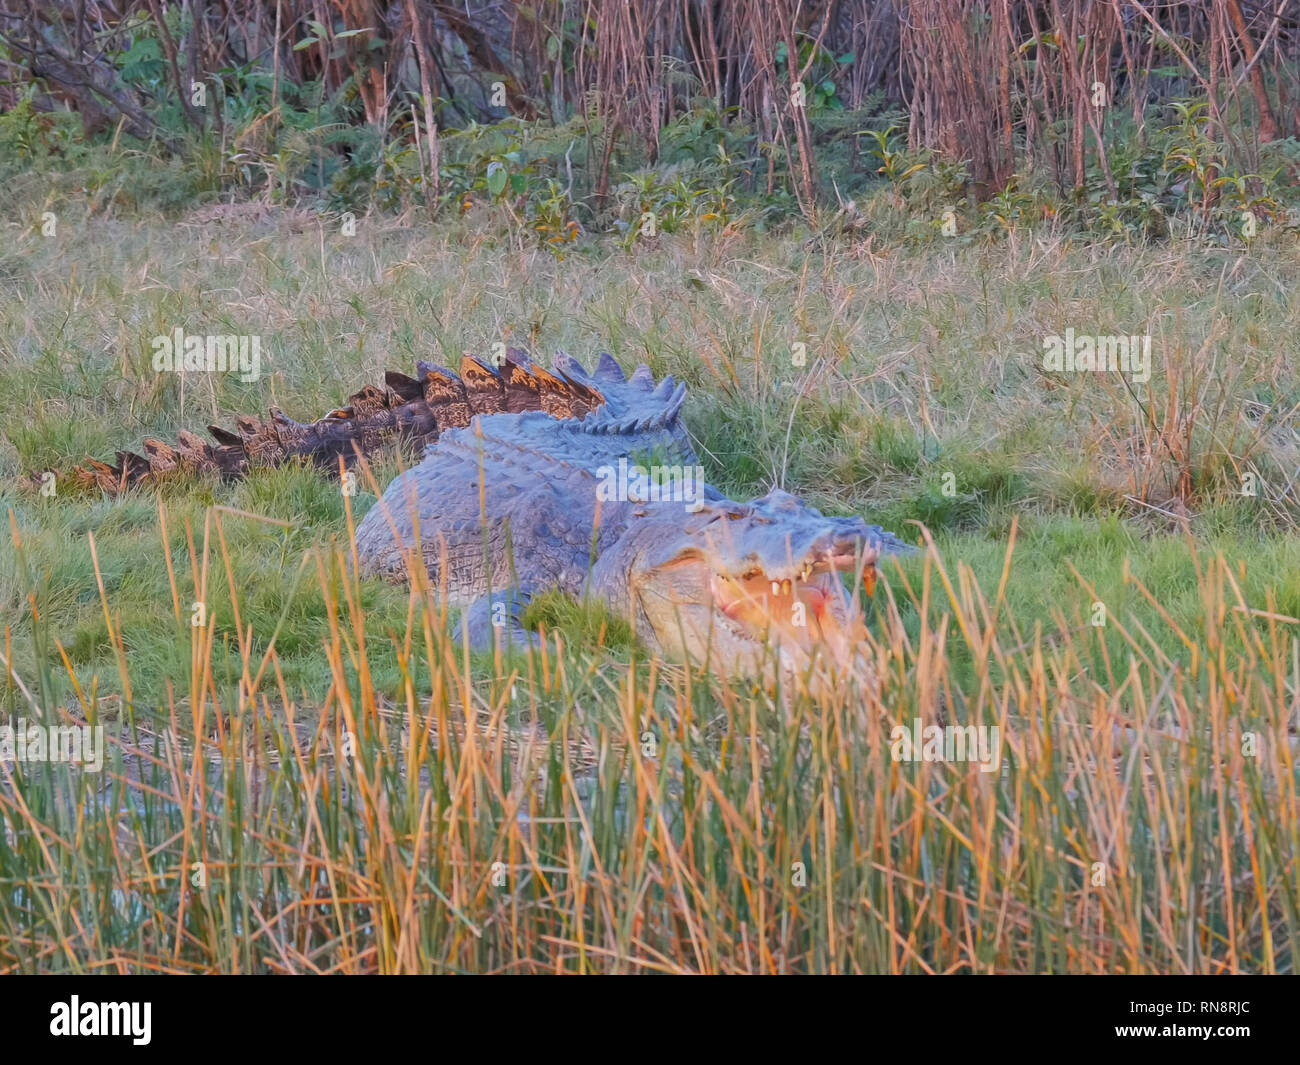 close up of a large estuarine crocodile at corroboree billabong in australia's northern territory - Stock Image